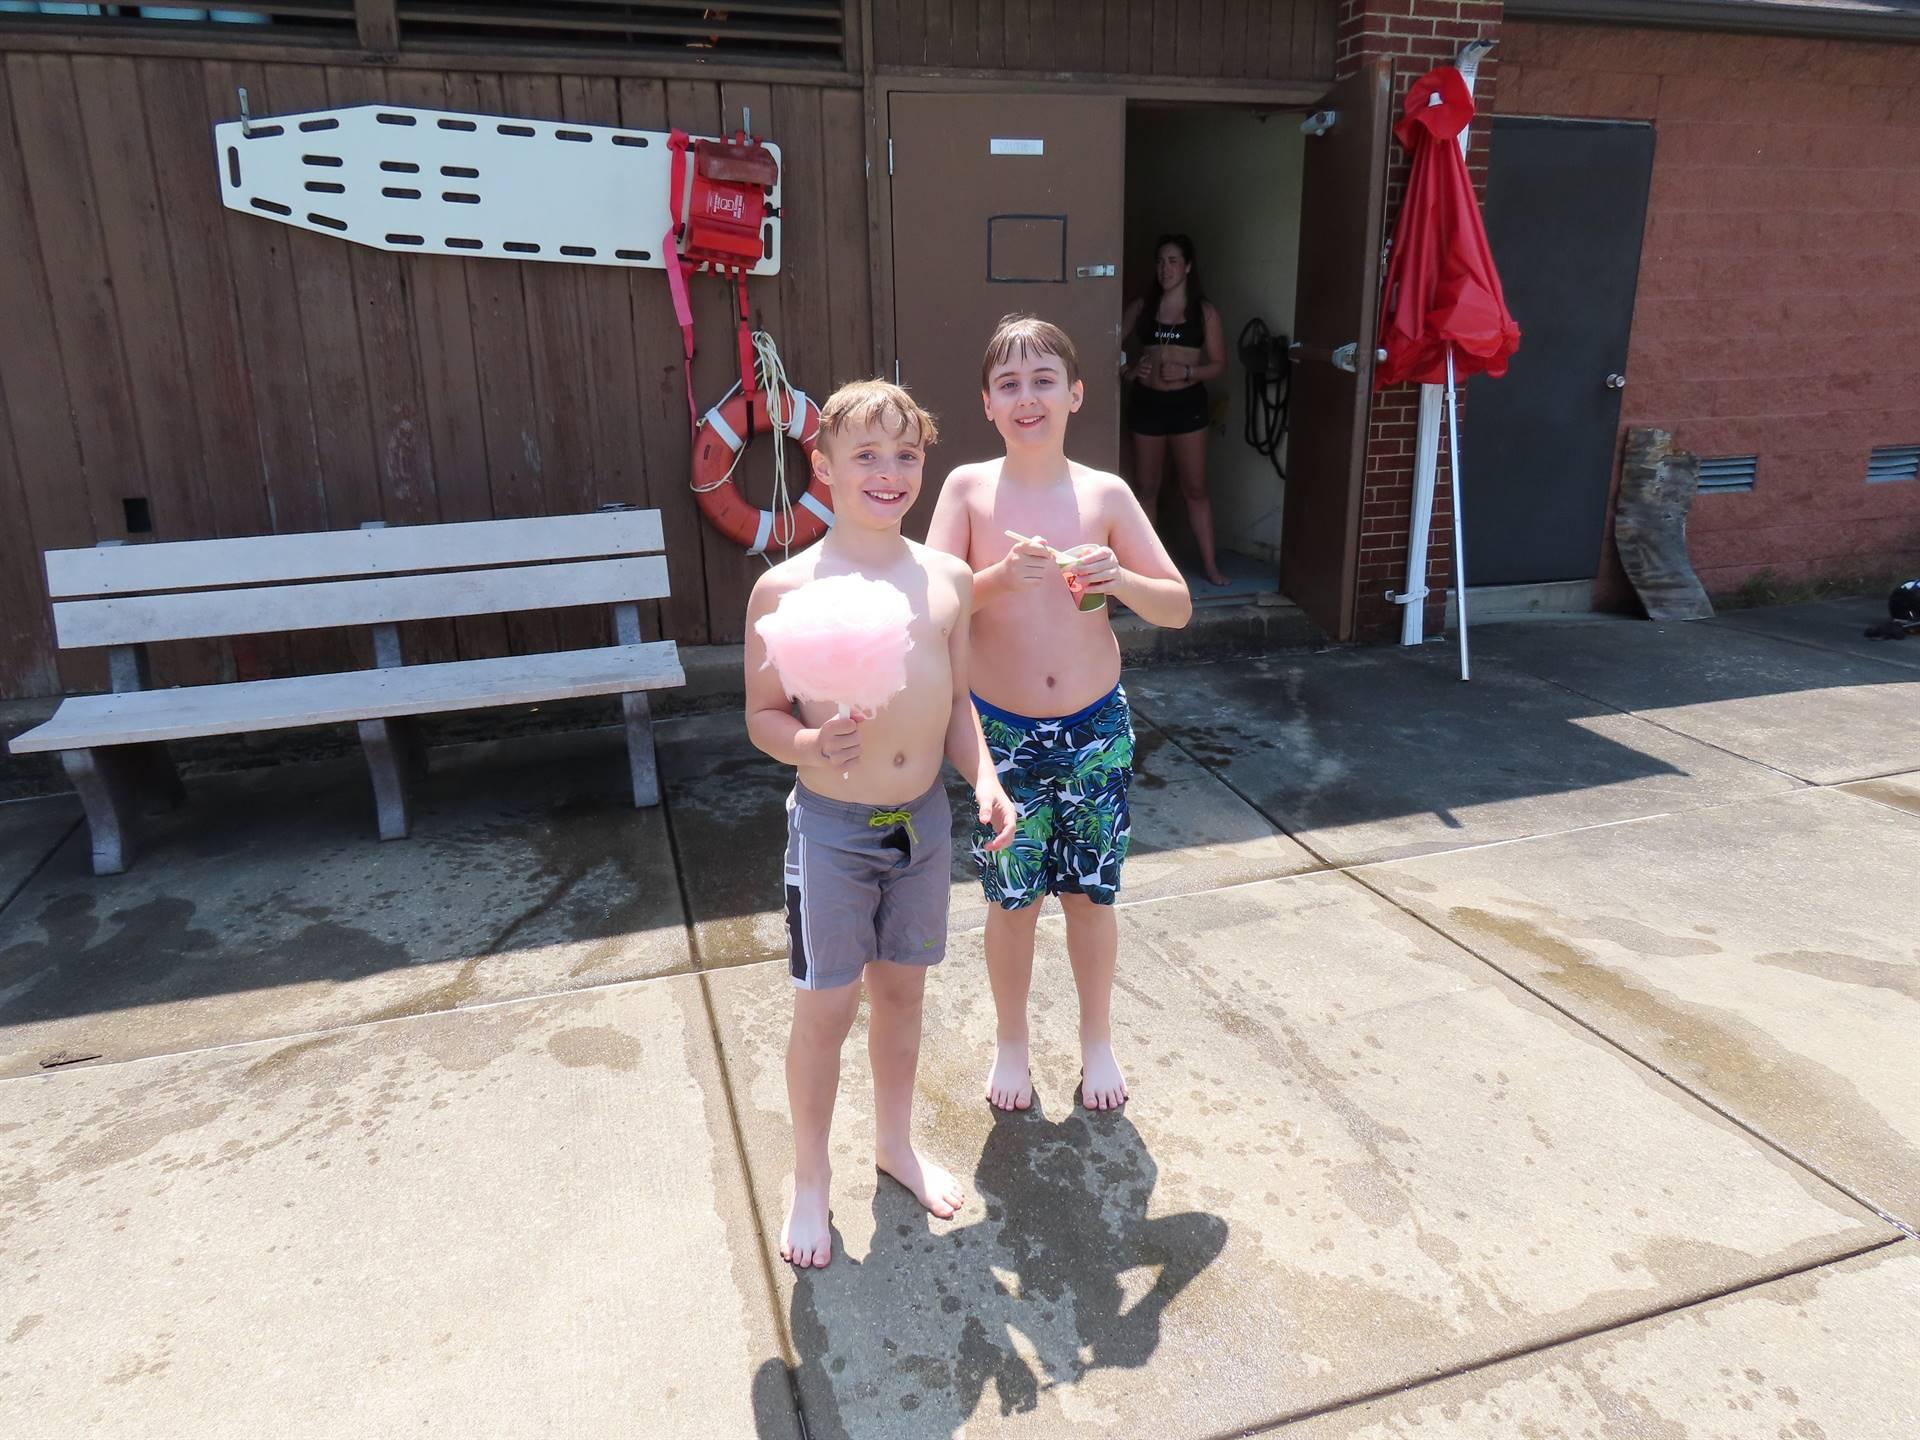 Boys enjoying snacks poolside